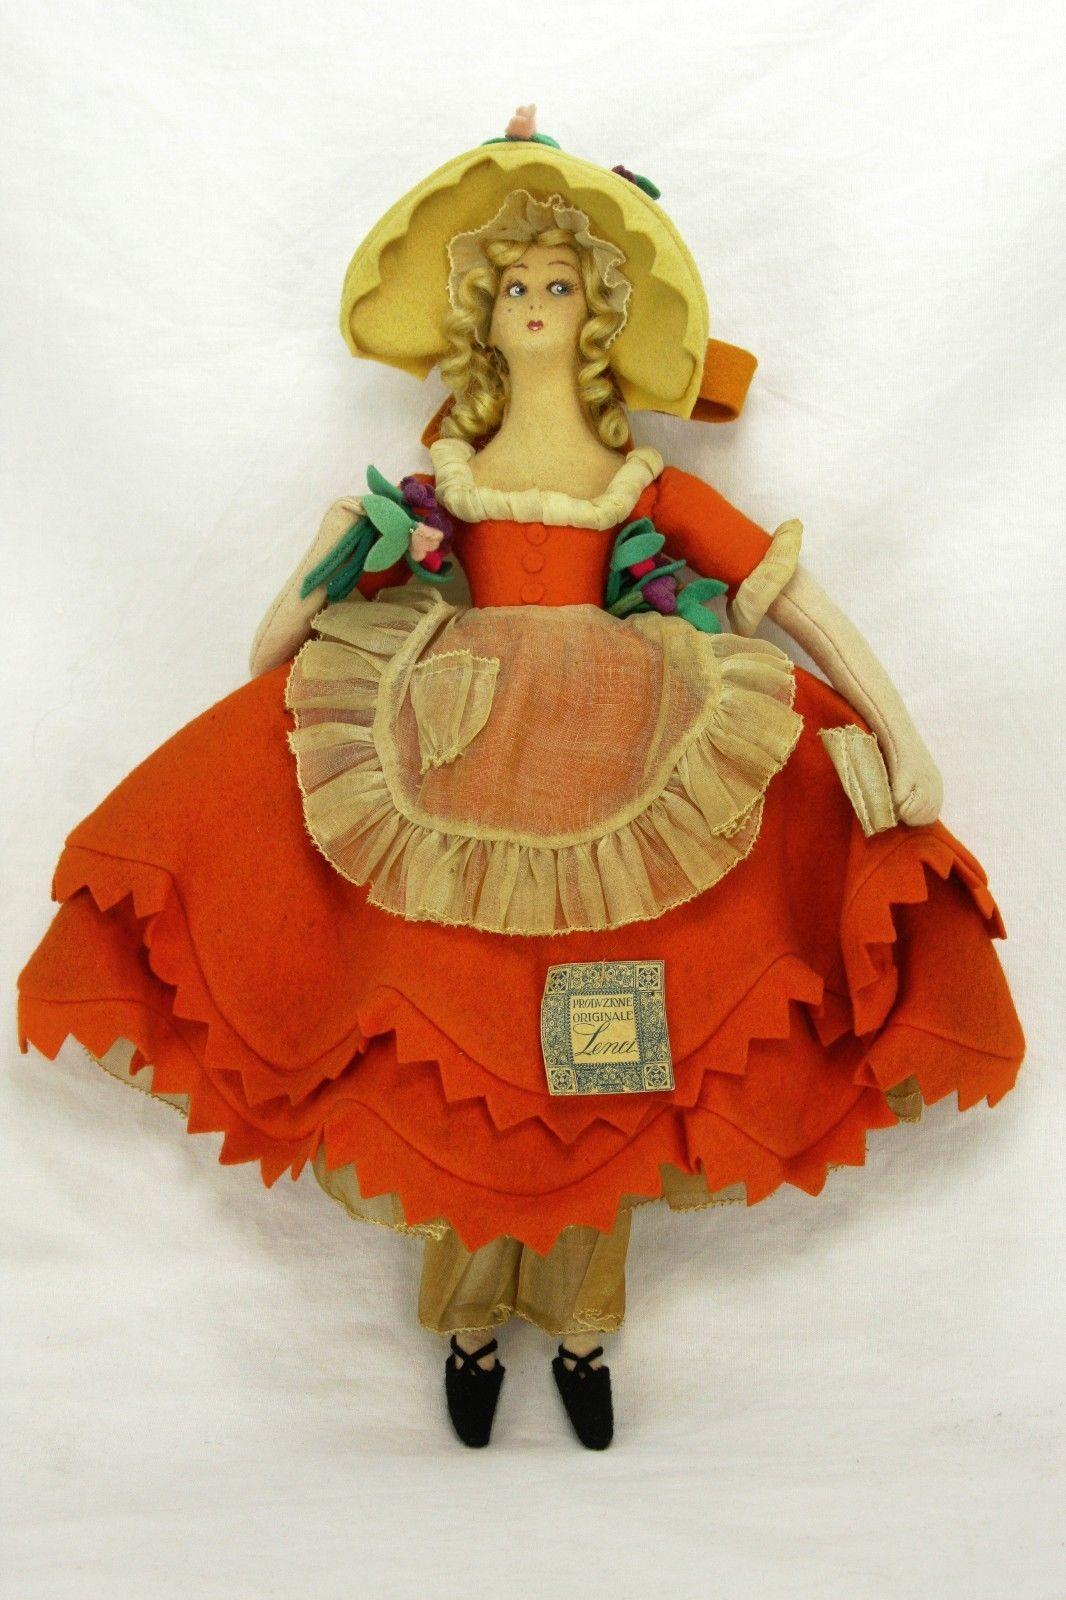 Antique Vintgae Rare Miniature Lenci Boudoir Doll Ca1920 Boudoir Dolls Antique Dolls Dolls